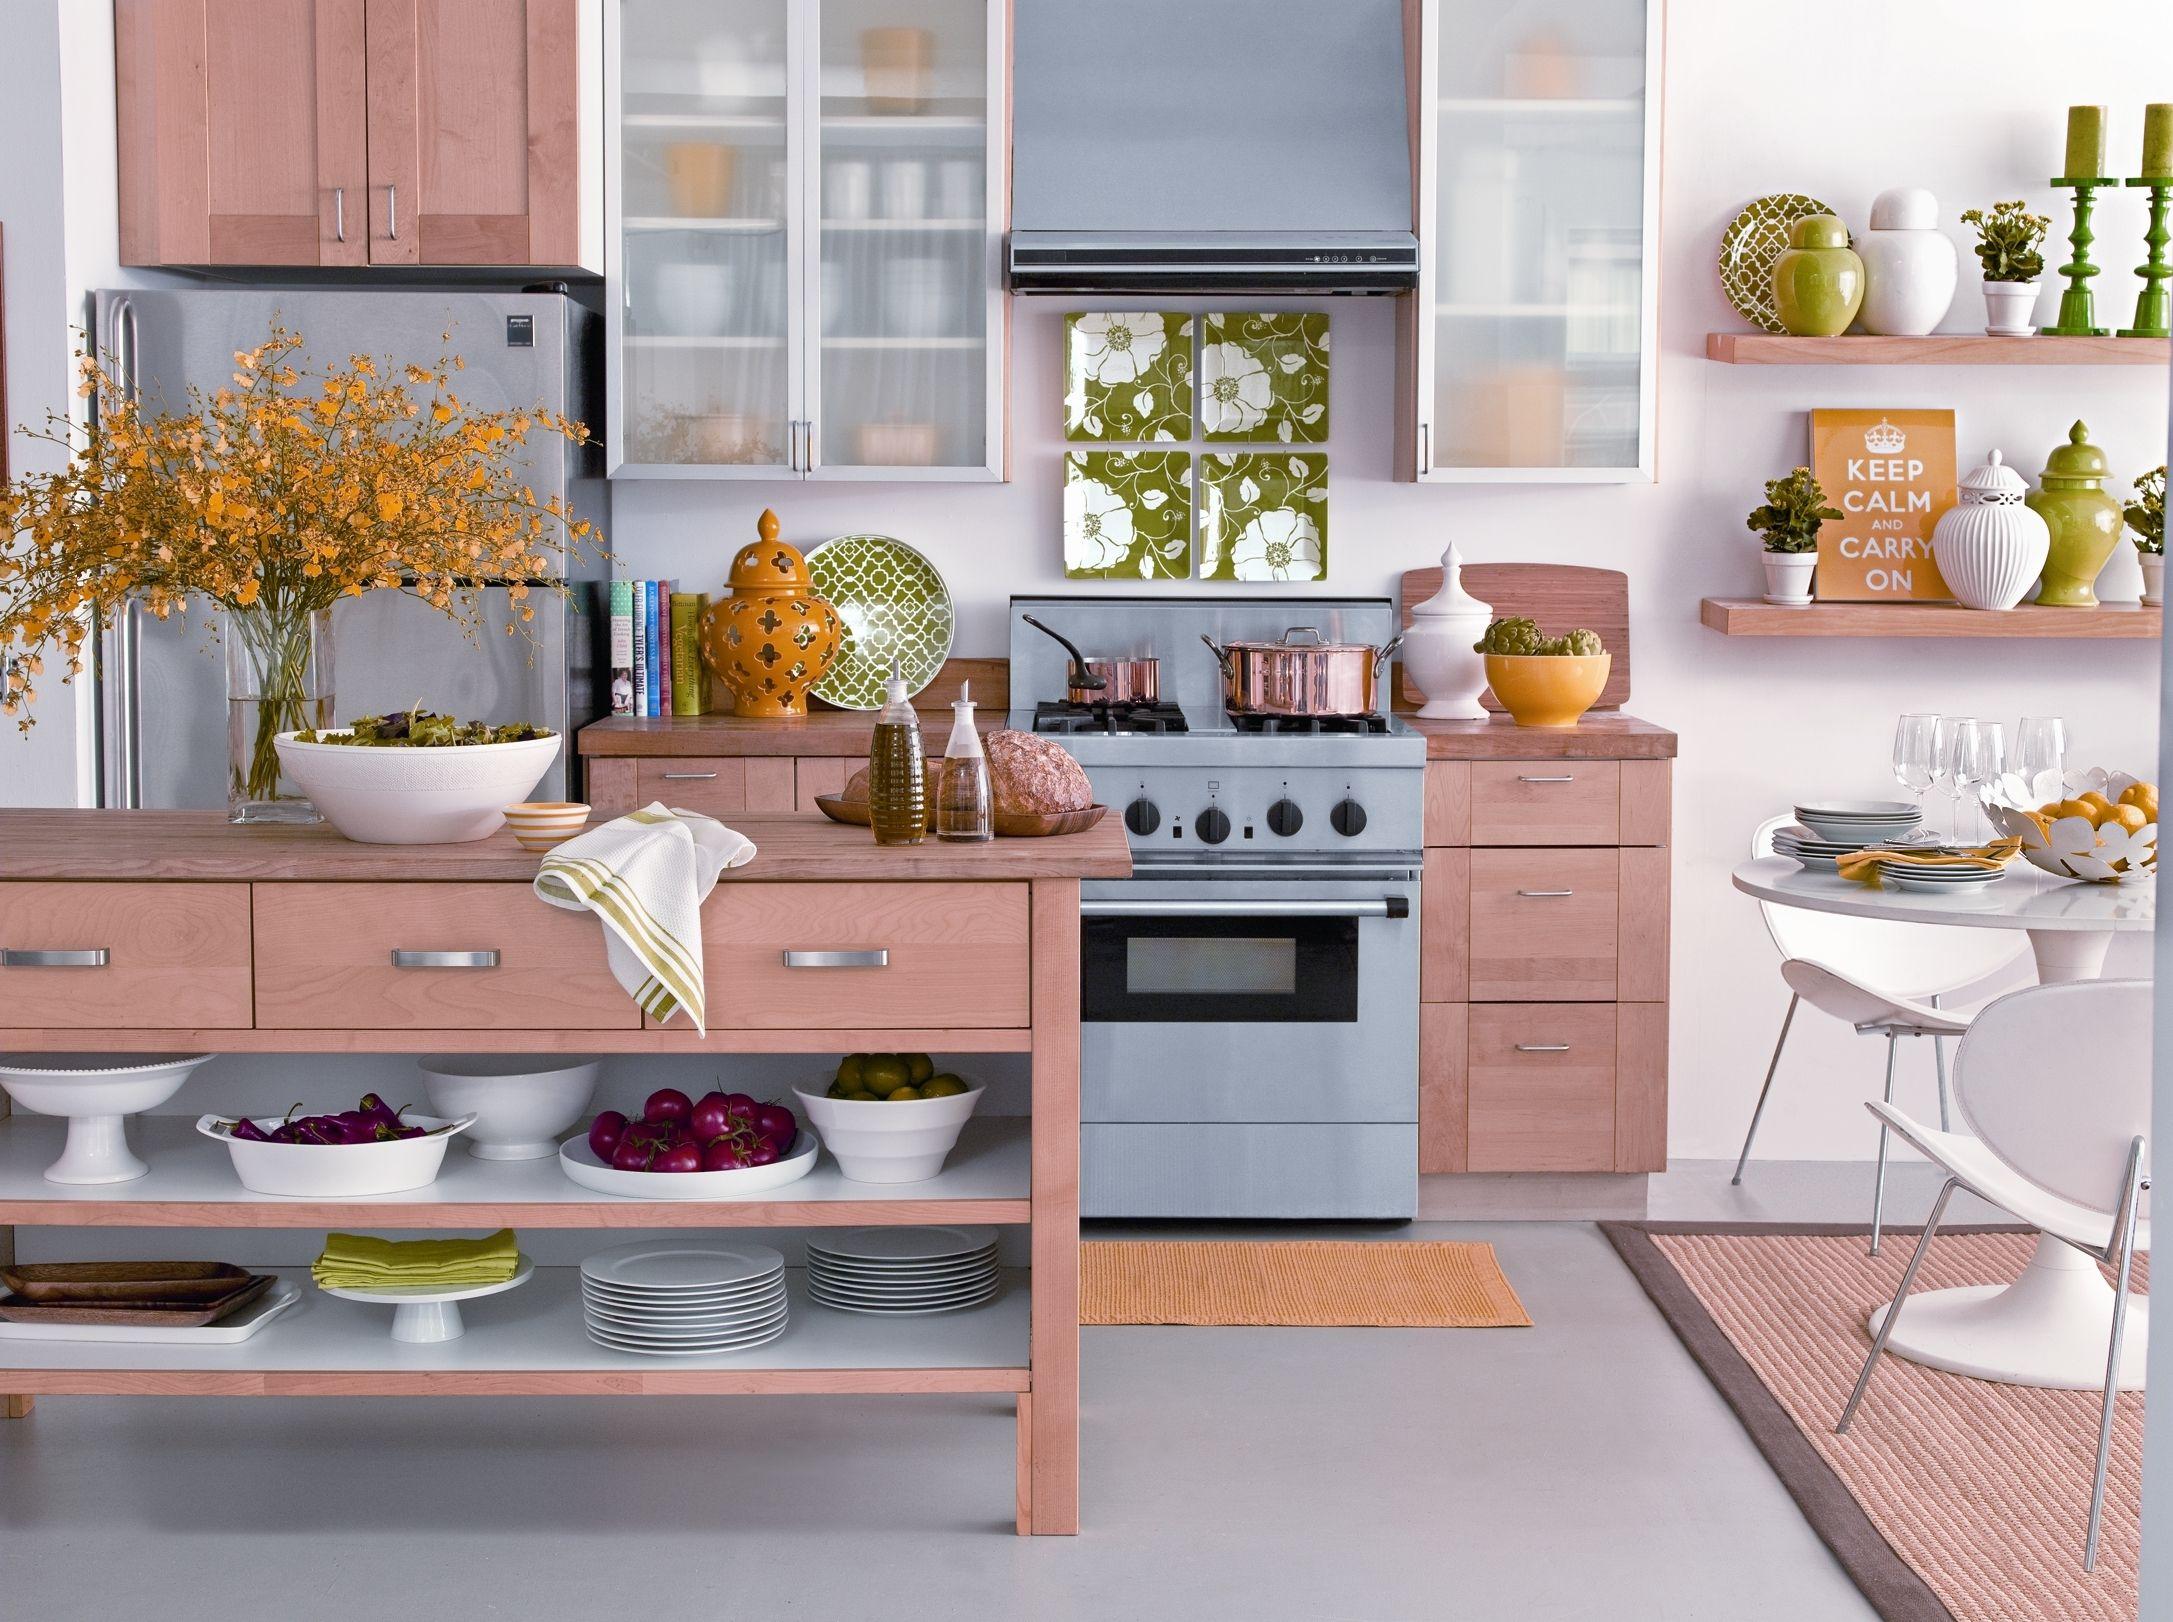 boho inspired kitchen homegoodshappy home kitchens home goods kitchen inspirations on boho chic kitchen table id=71295